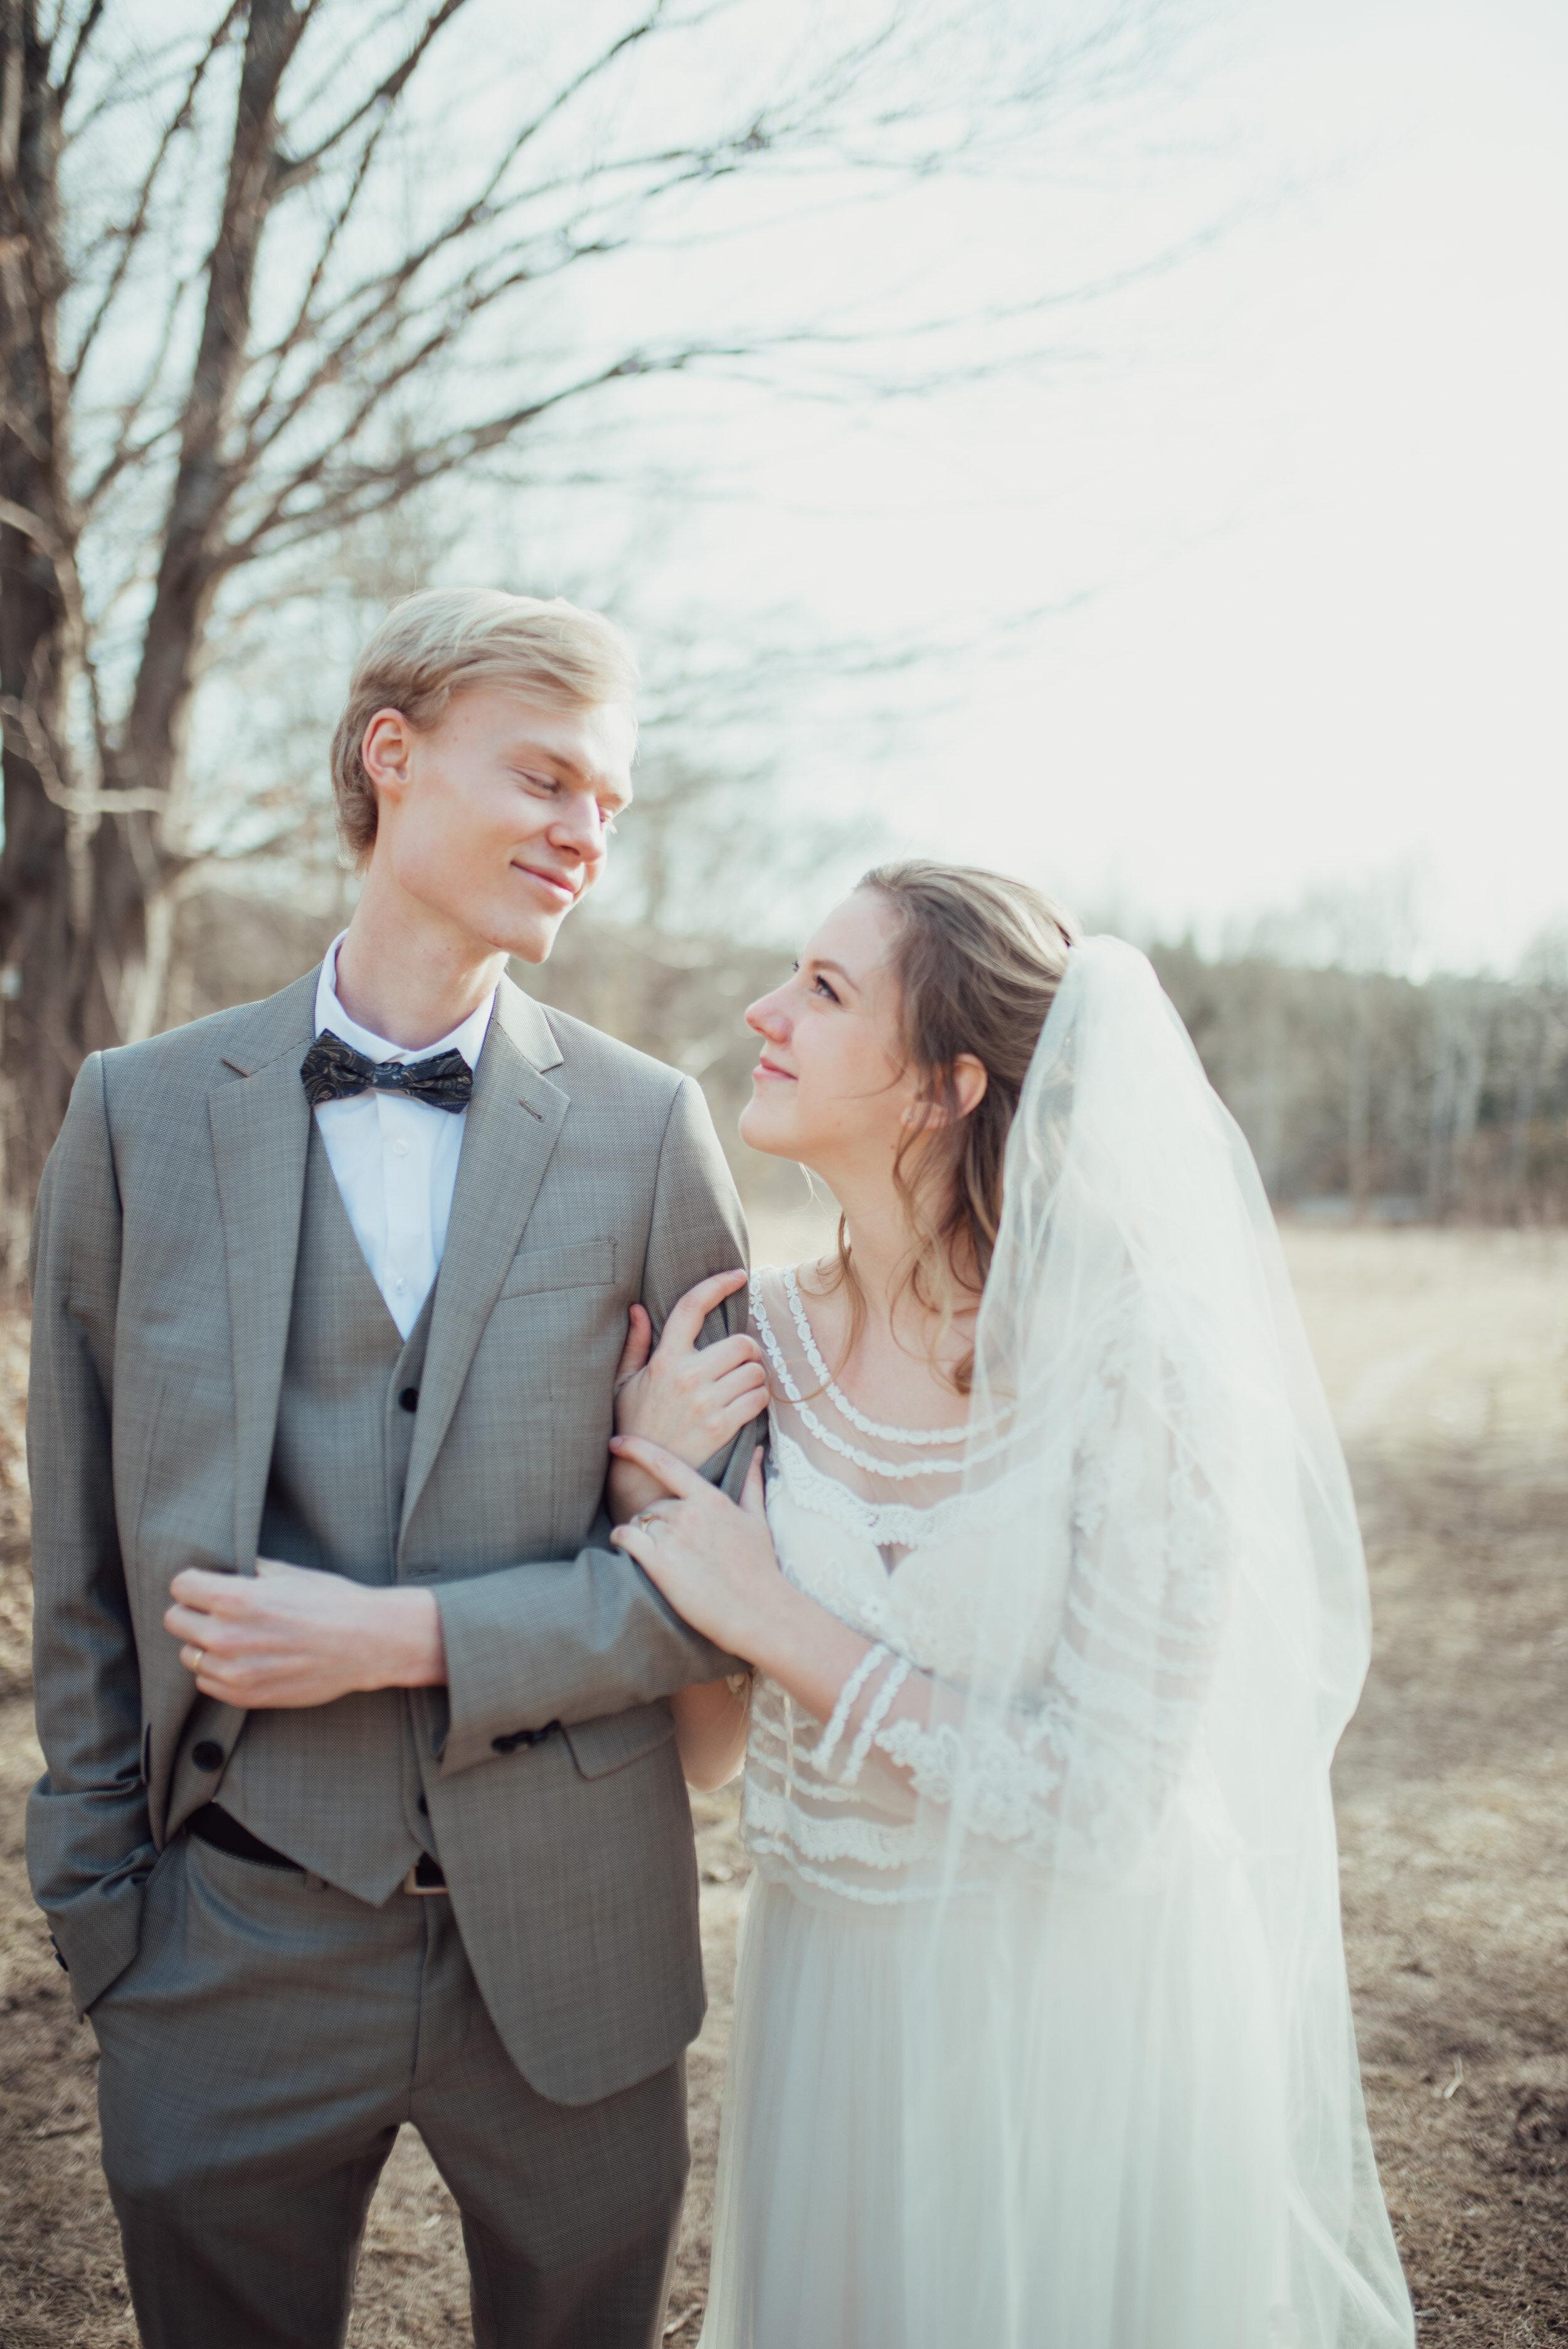 cleland-fine-art-wedding-photography-4.jpg